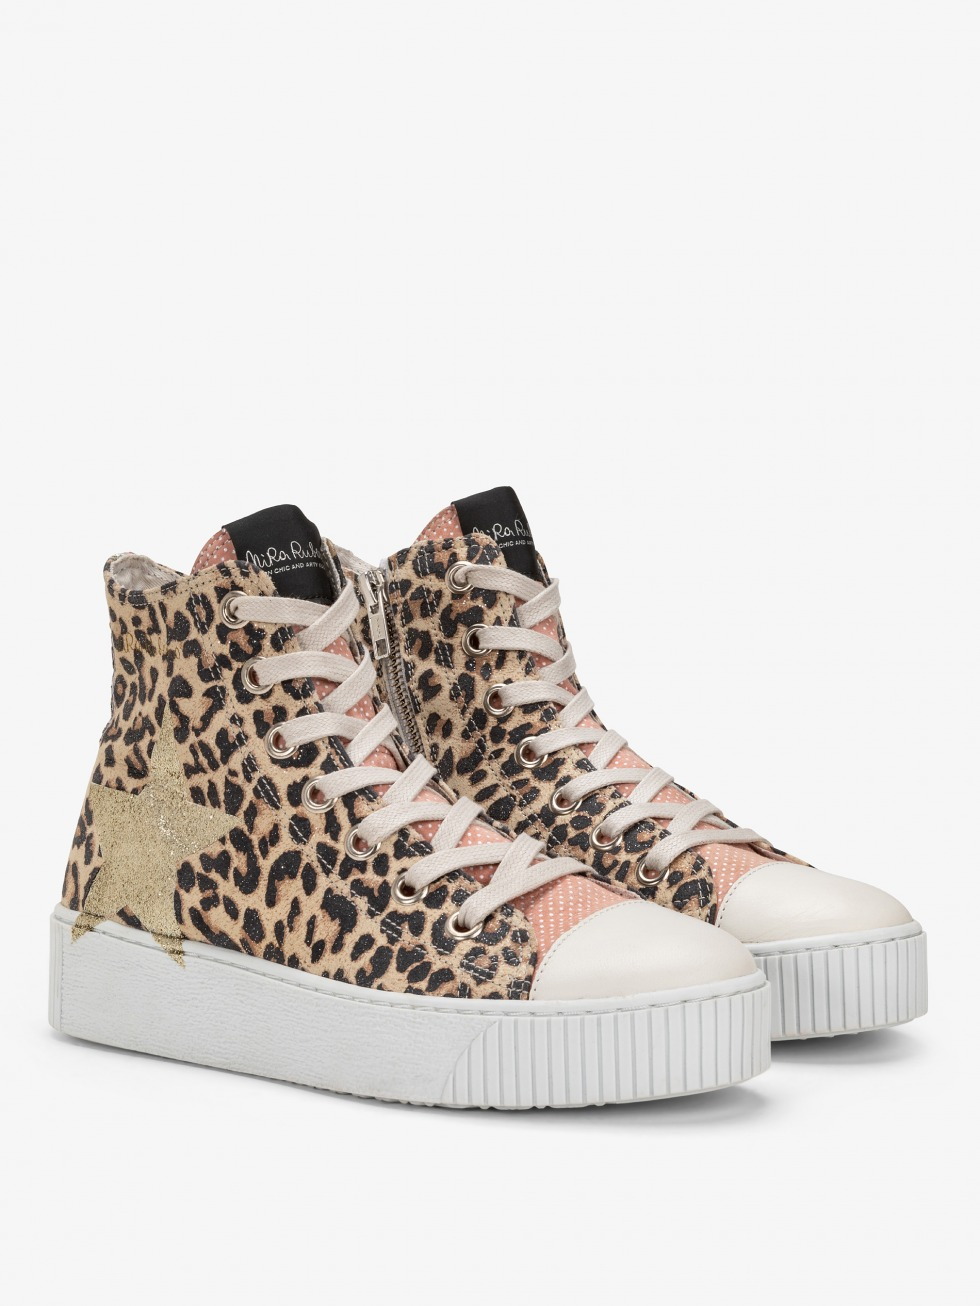 Long Island Sneakers - Sorbetto Star